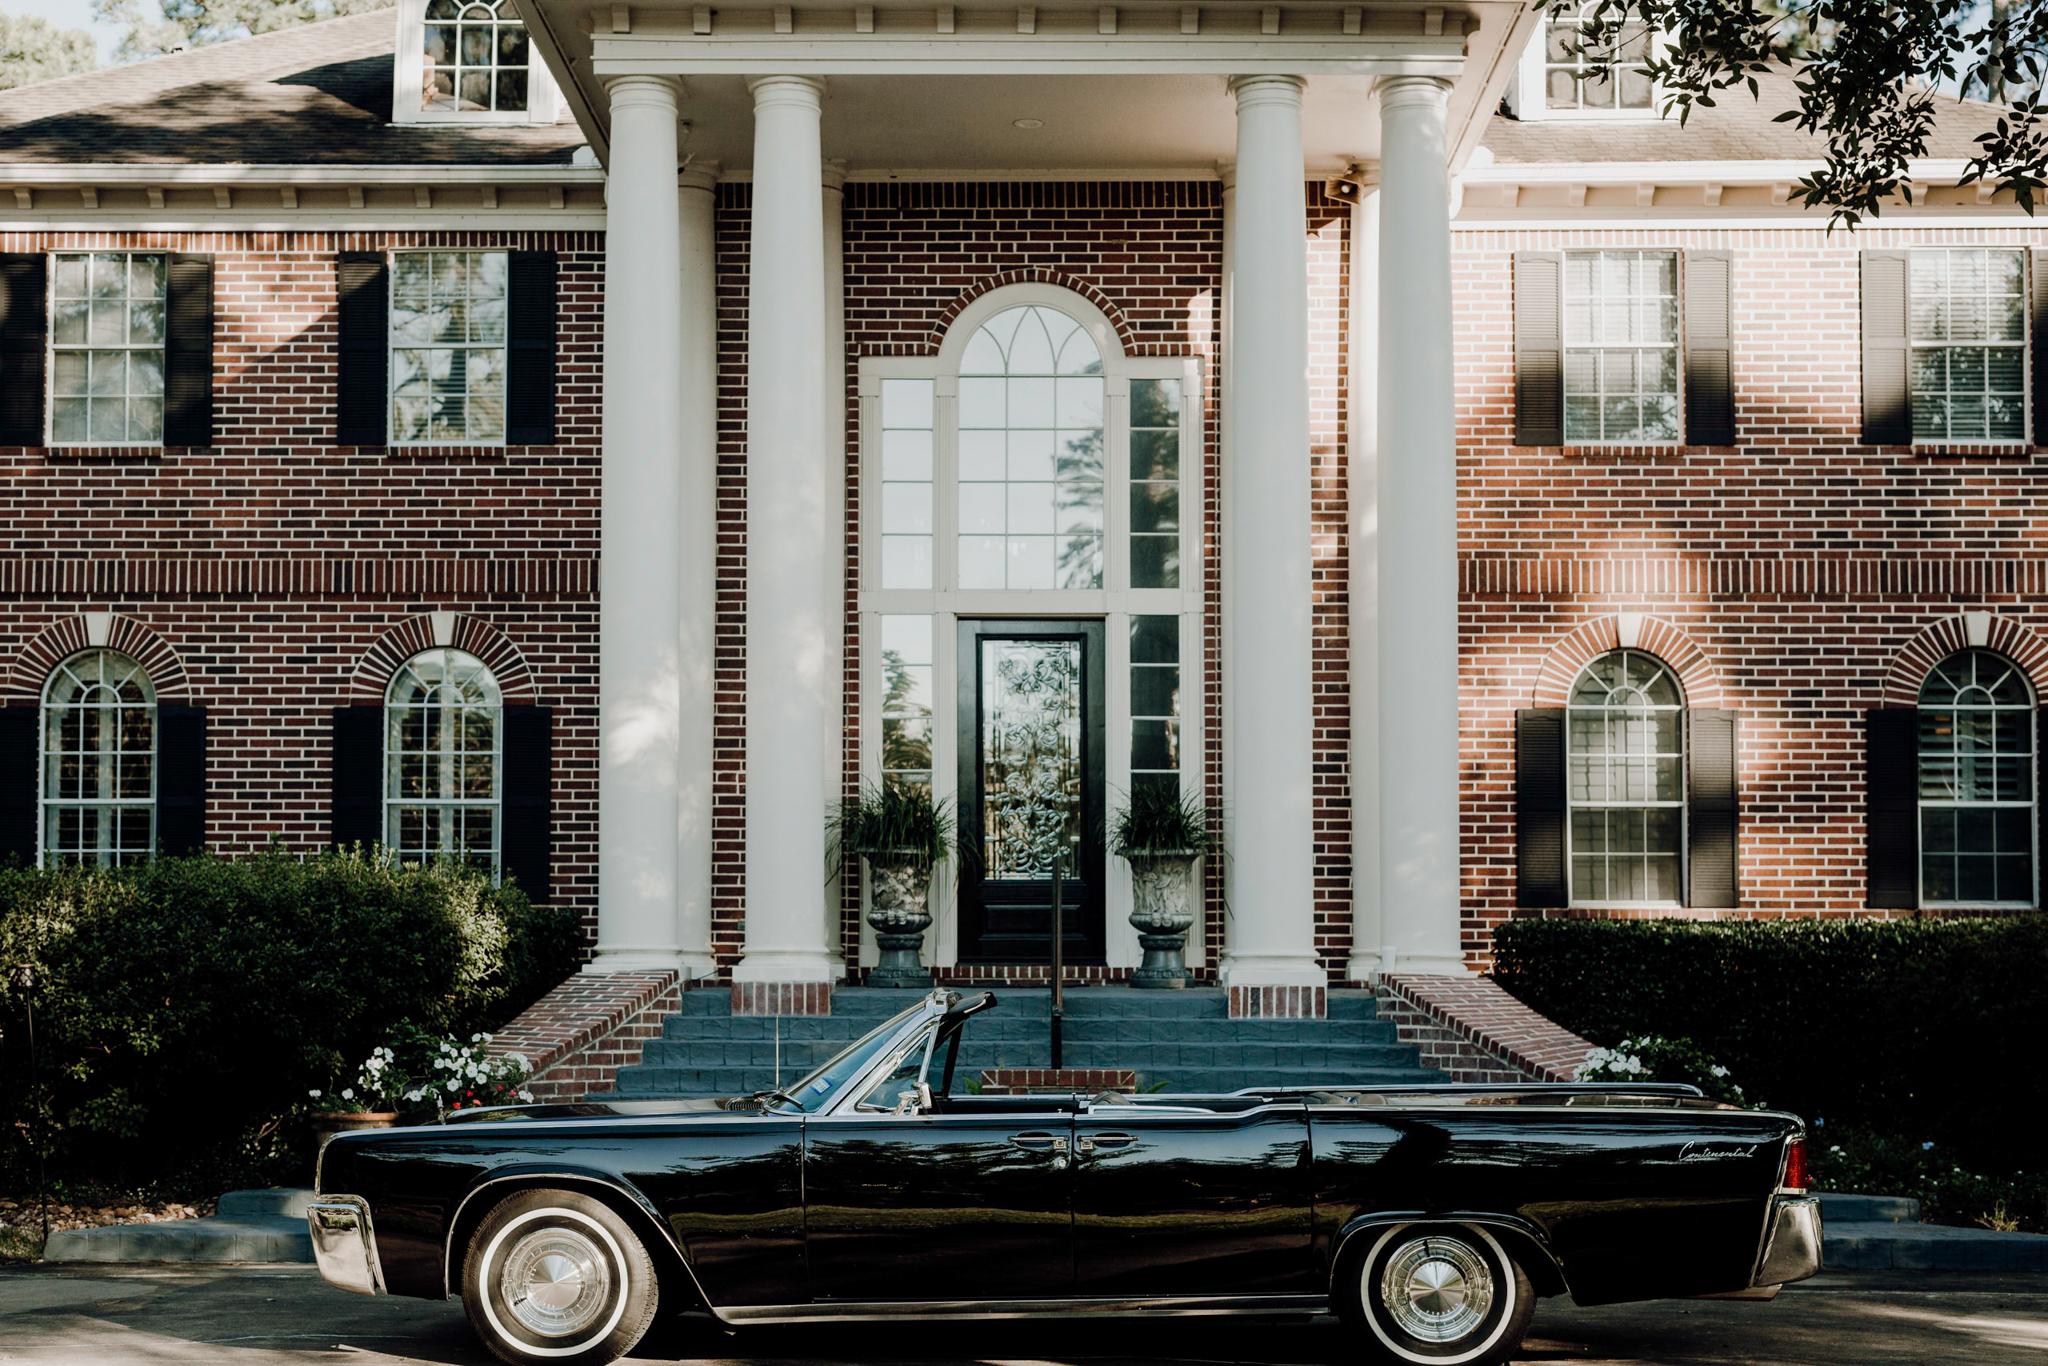 Houston Wedding Photographer-Intimate Texas Backyard Wedding- Houston Wedding Photographer -Kristen Giles Photography-28.jpg